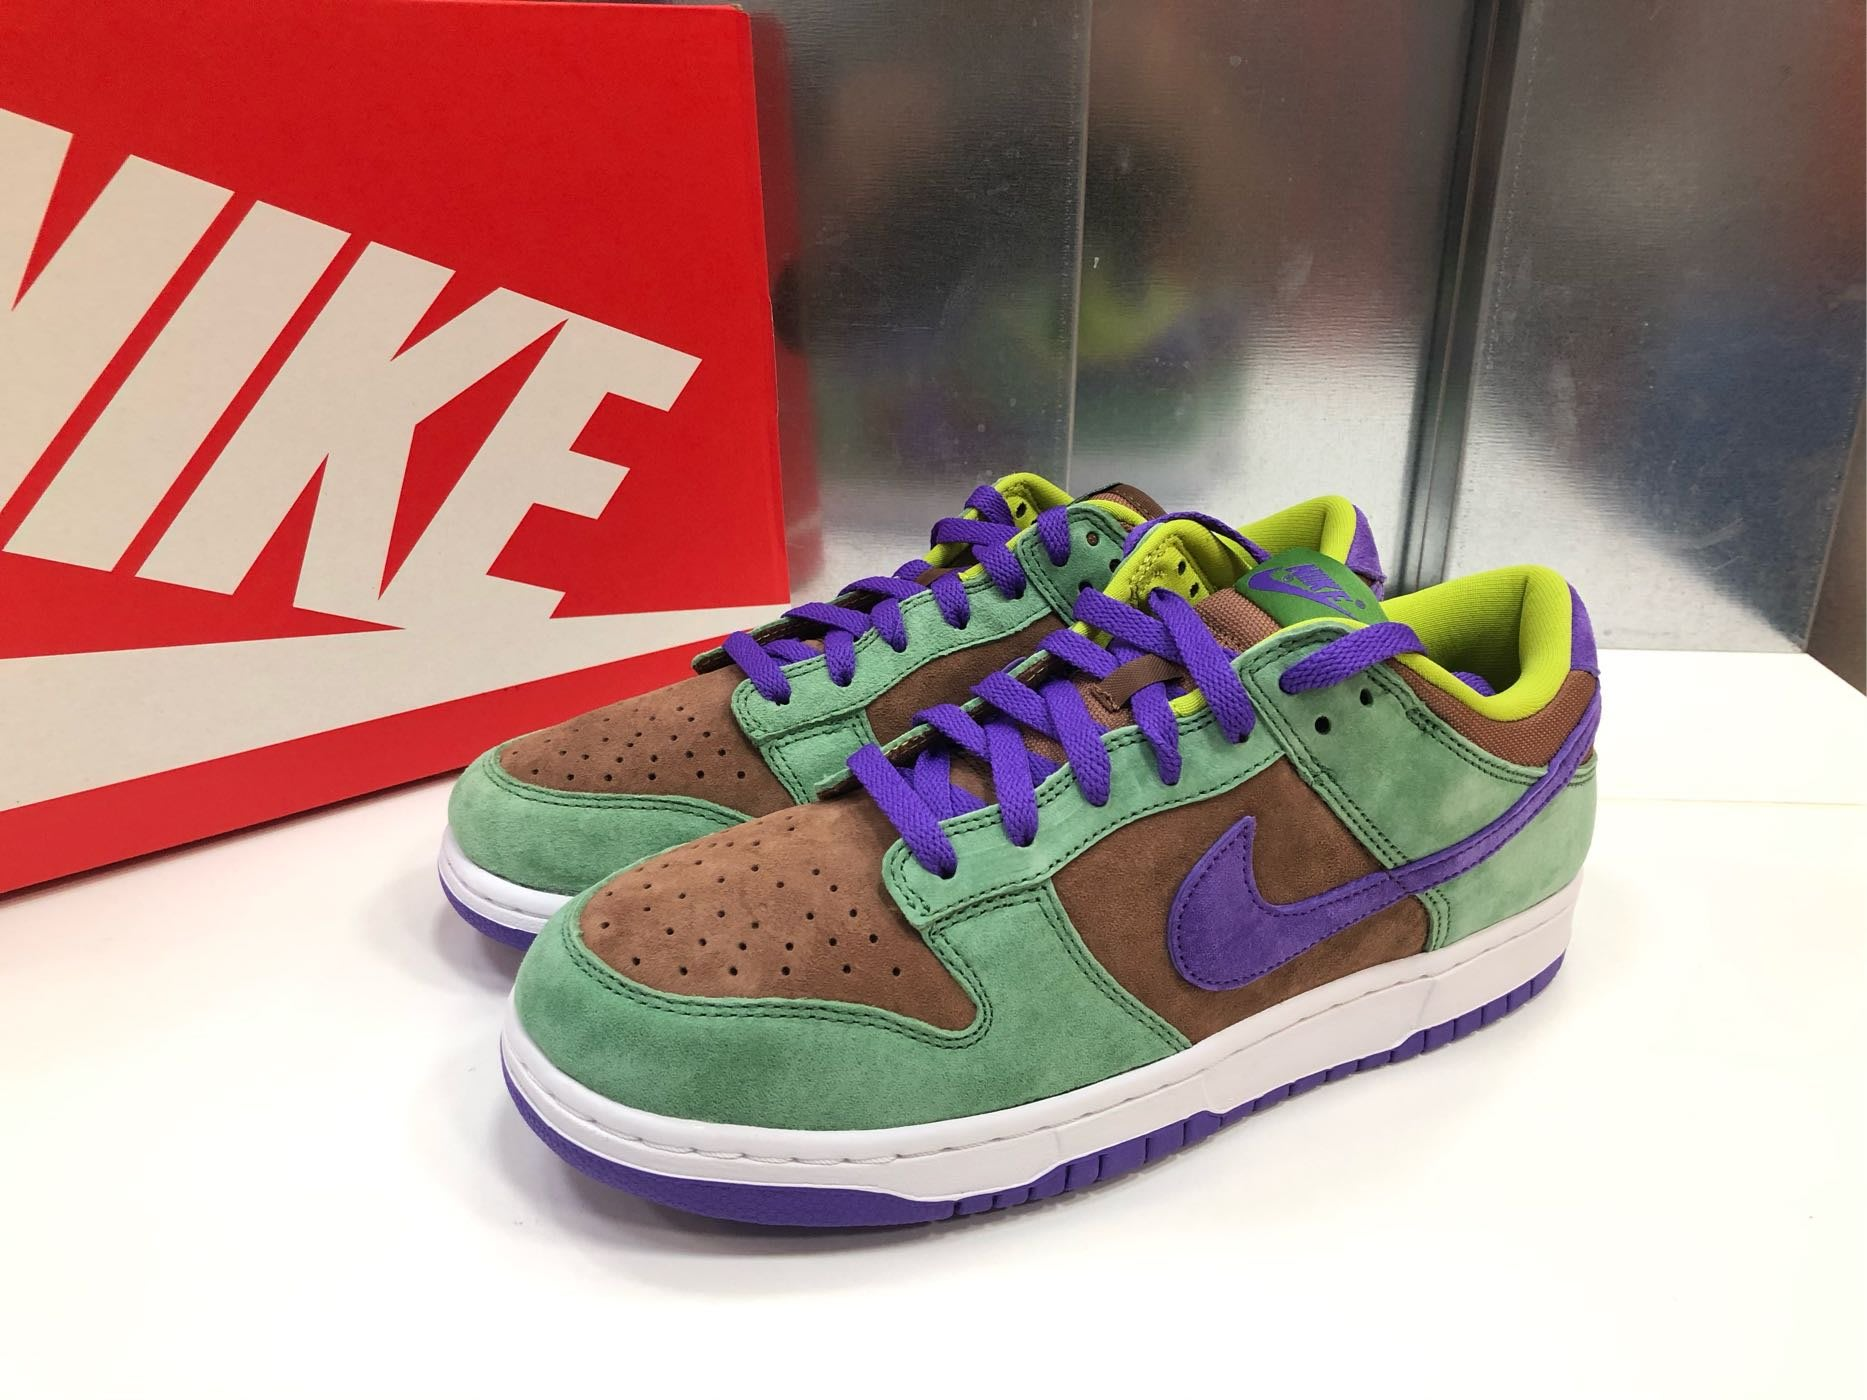 2020 Nike Dunk Low veneer DA1469-600低筒 醜小鴨 棕綠 麂皮 現貨 us6 全新正品